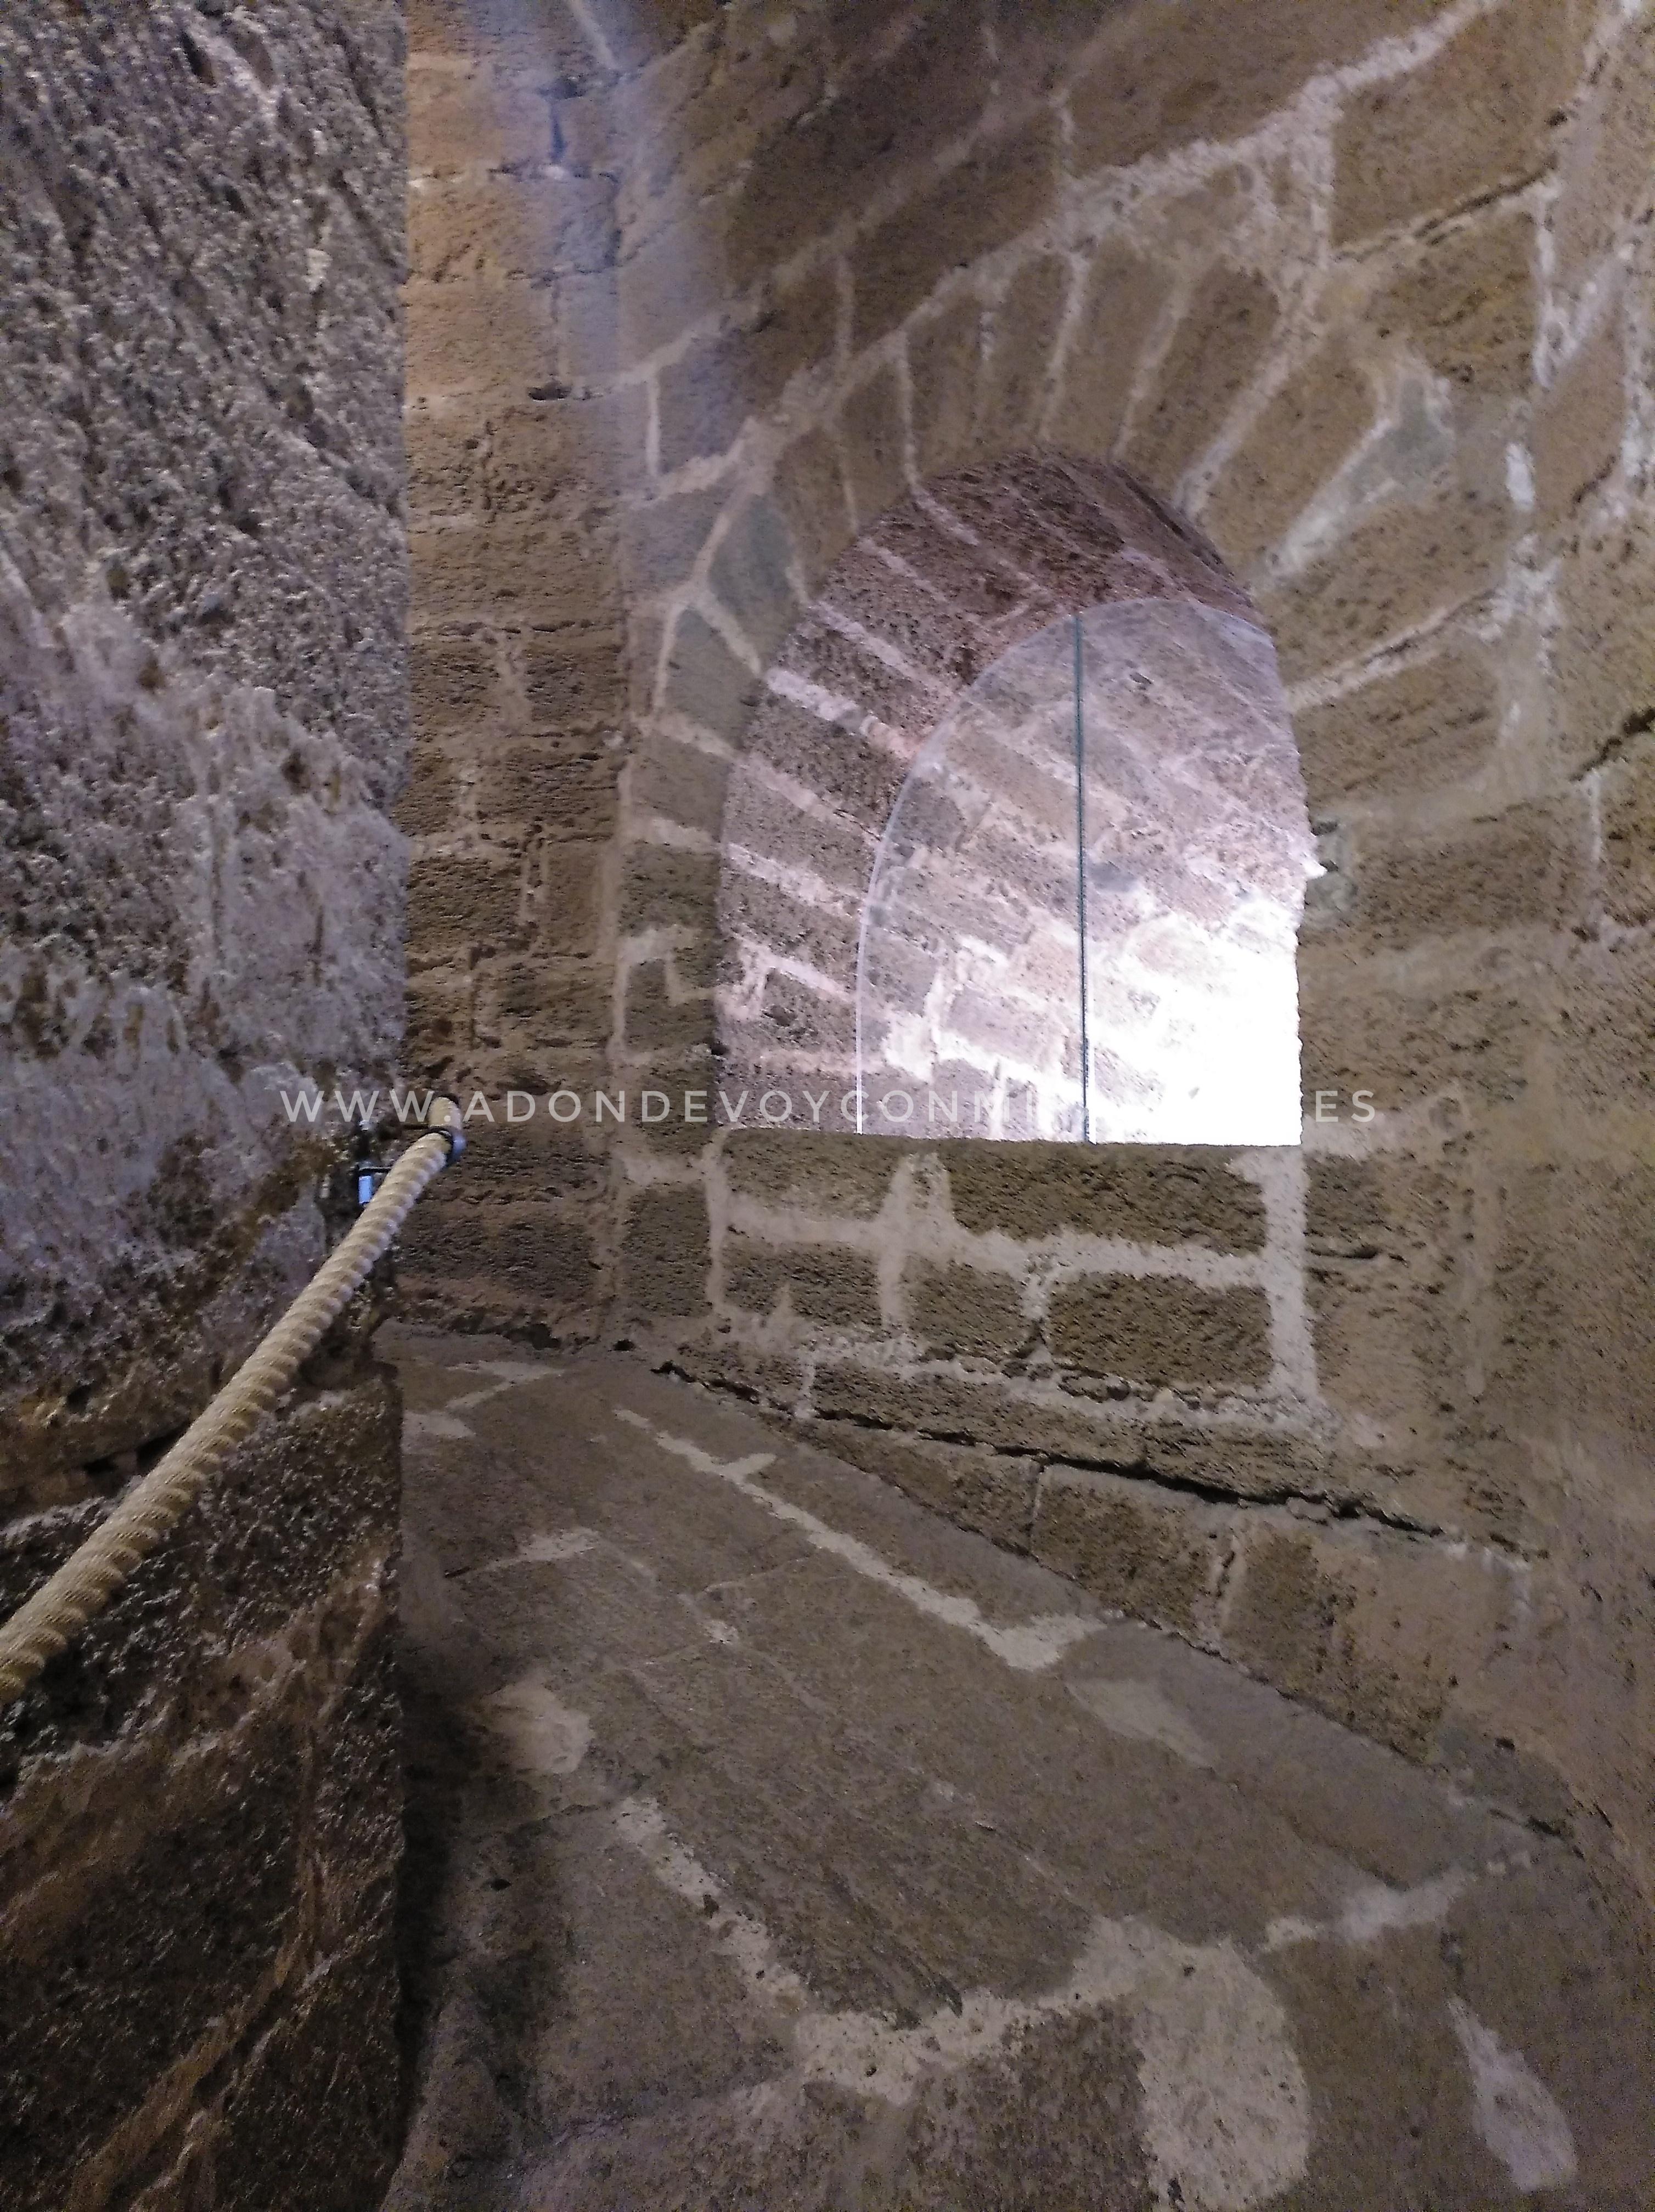 MI BLOG | Torre del Reloj de la Catedral de Cádiz con Niños